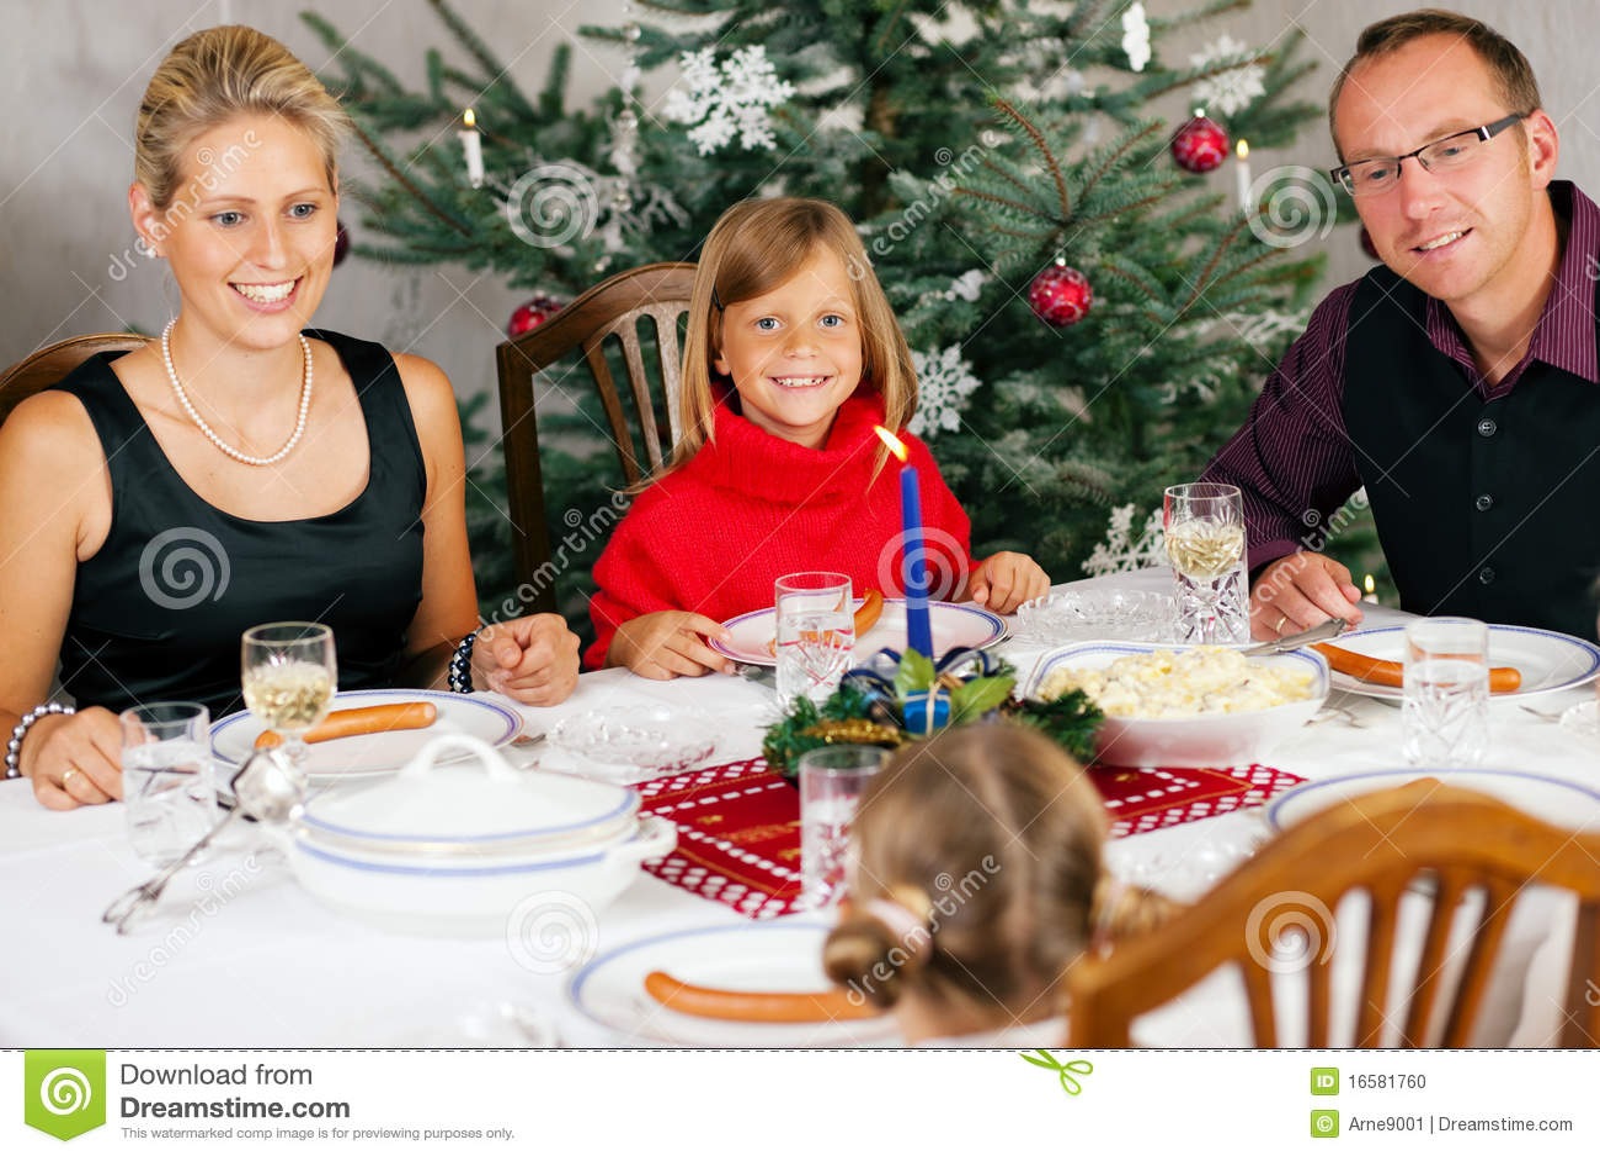 Familienfeier stockfoto. Bild von frau, fokus, mann, kind